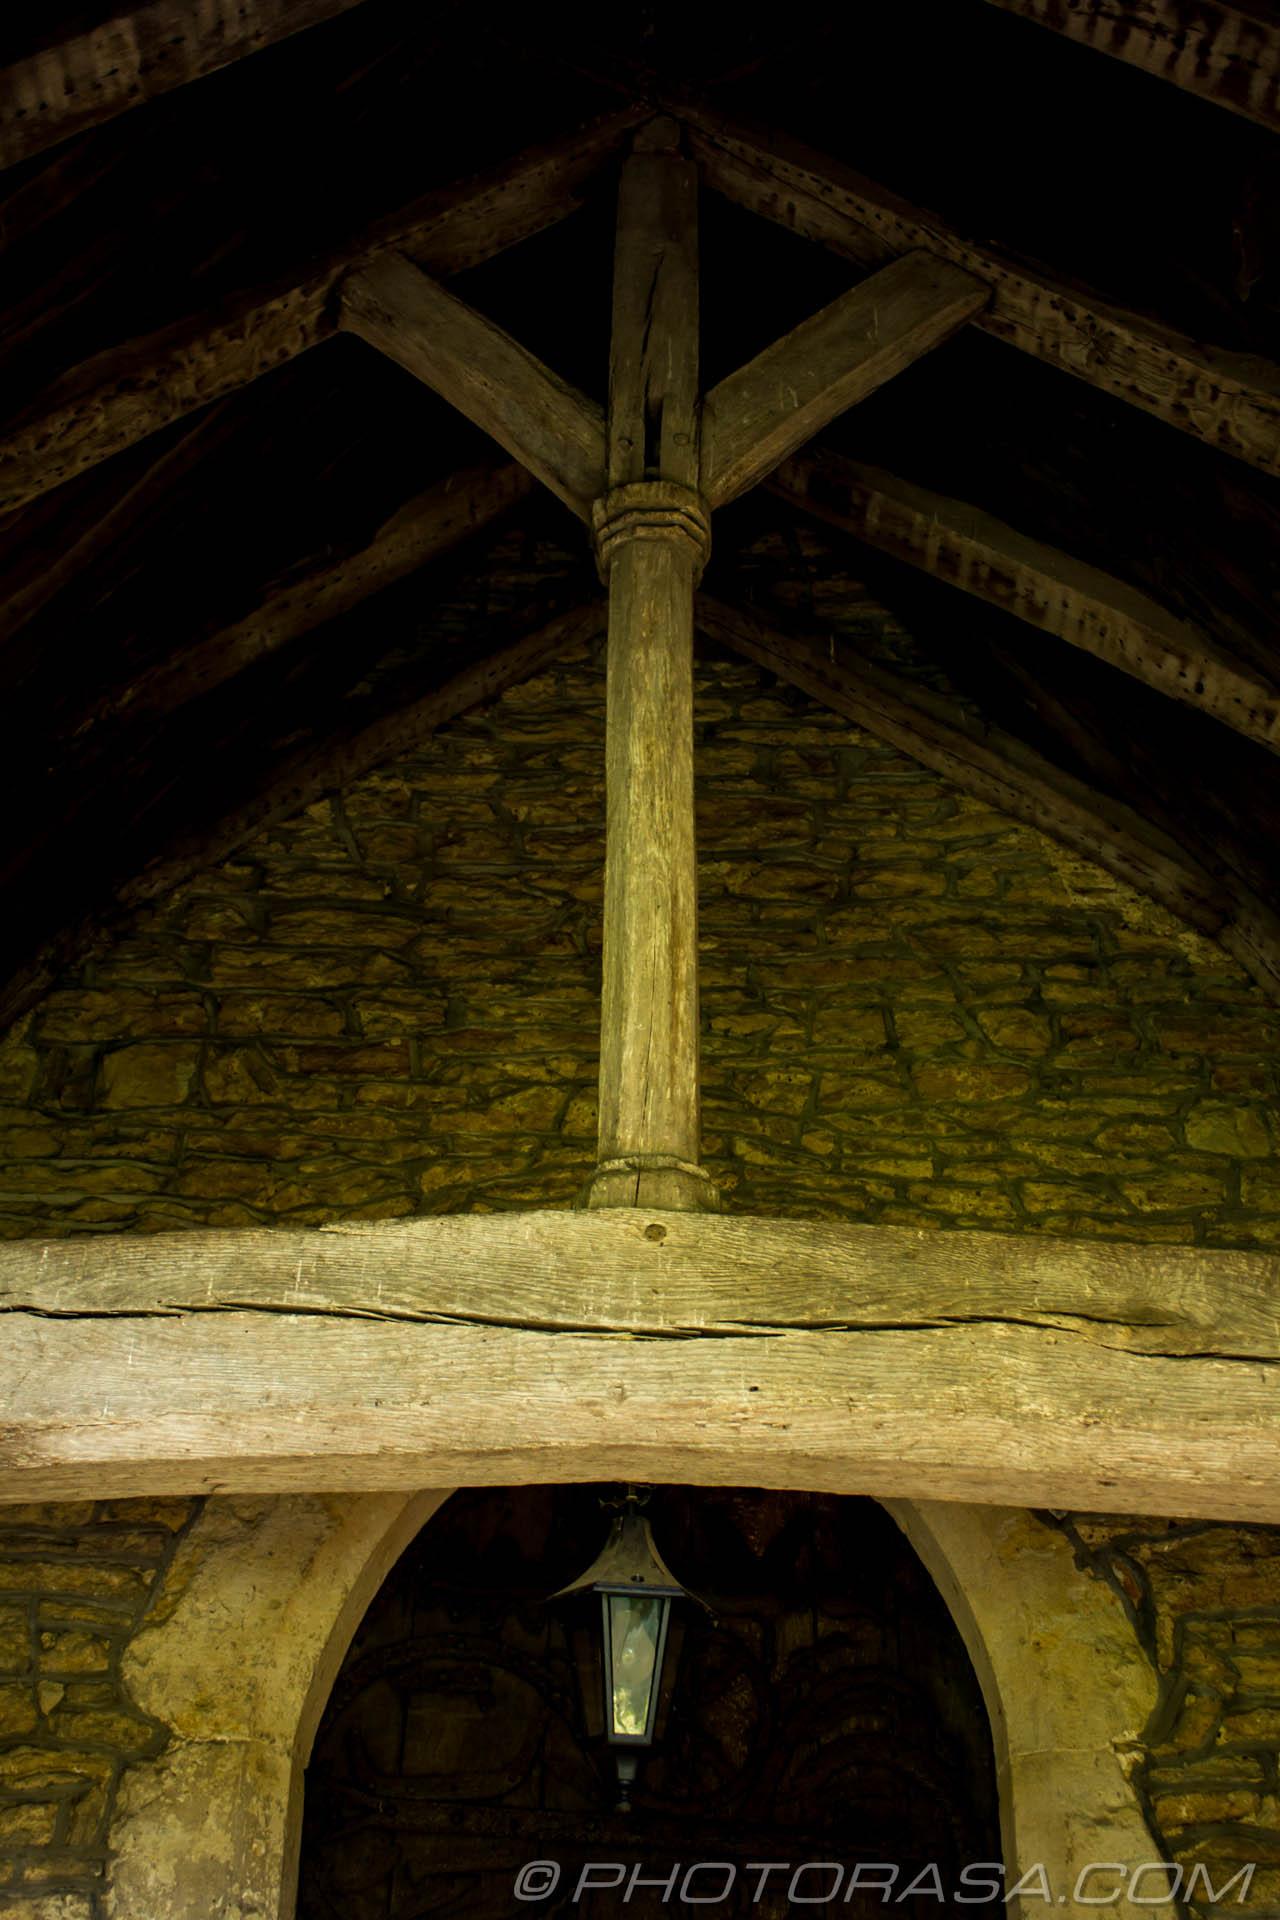 https://photorasa.com/saints-church-staplehurst-kent/medieval-beam/